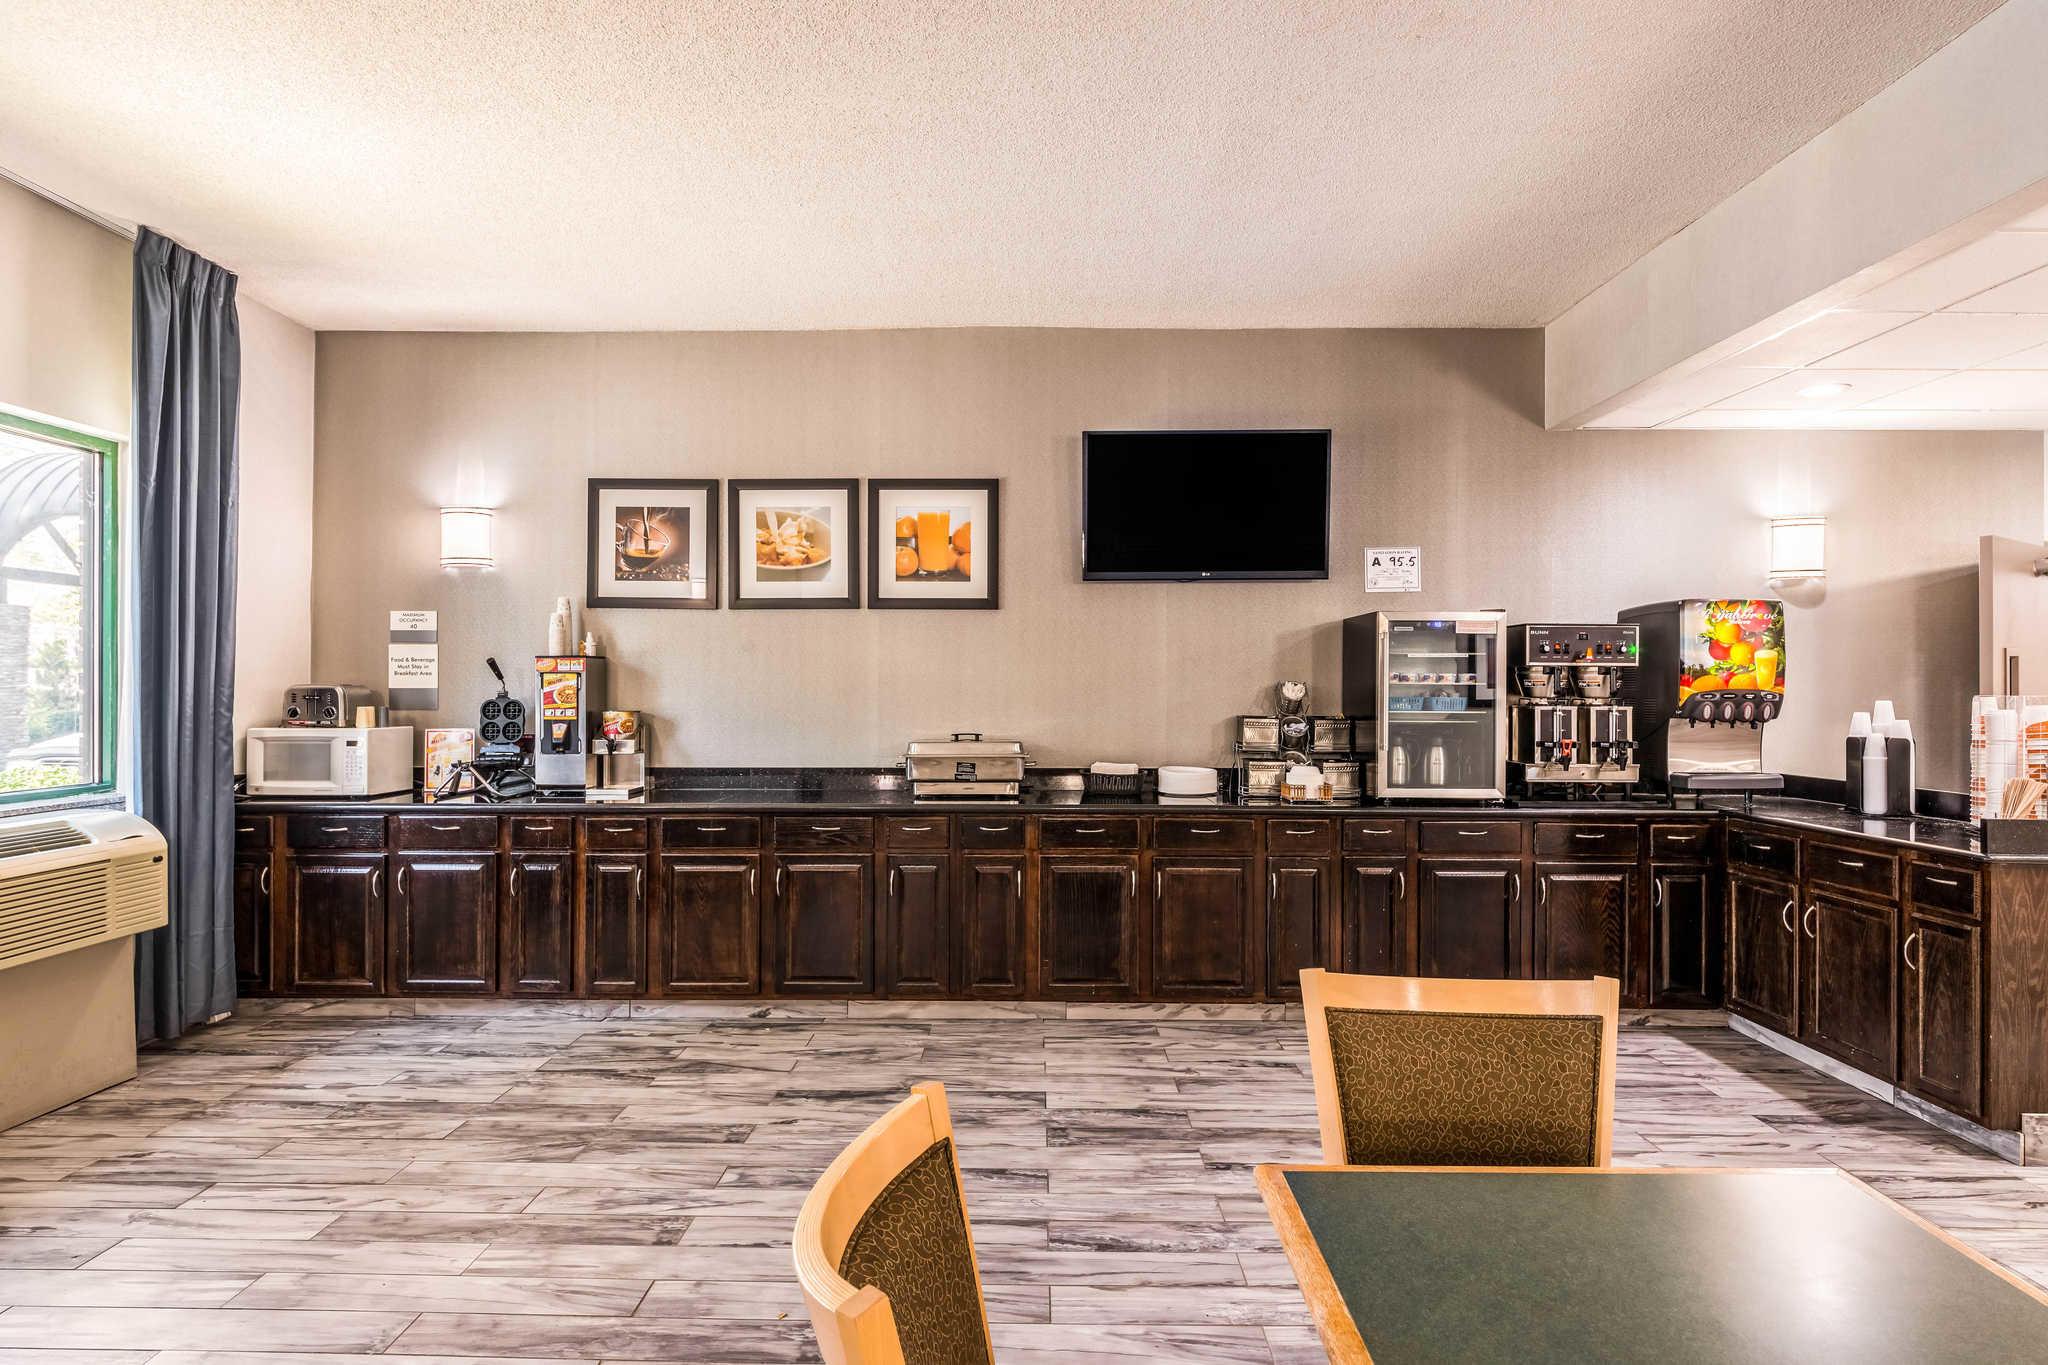 Clarion Inn & Suites image 37